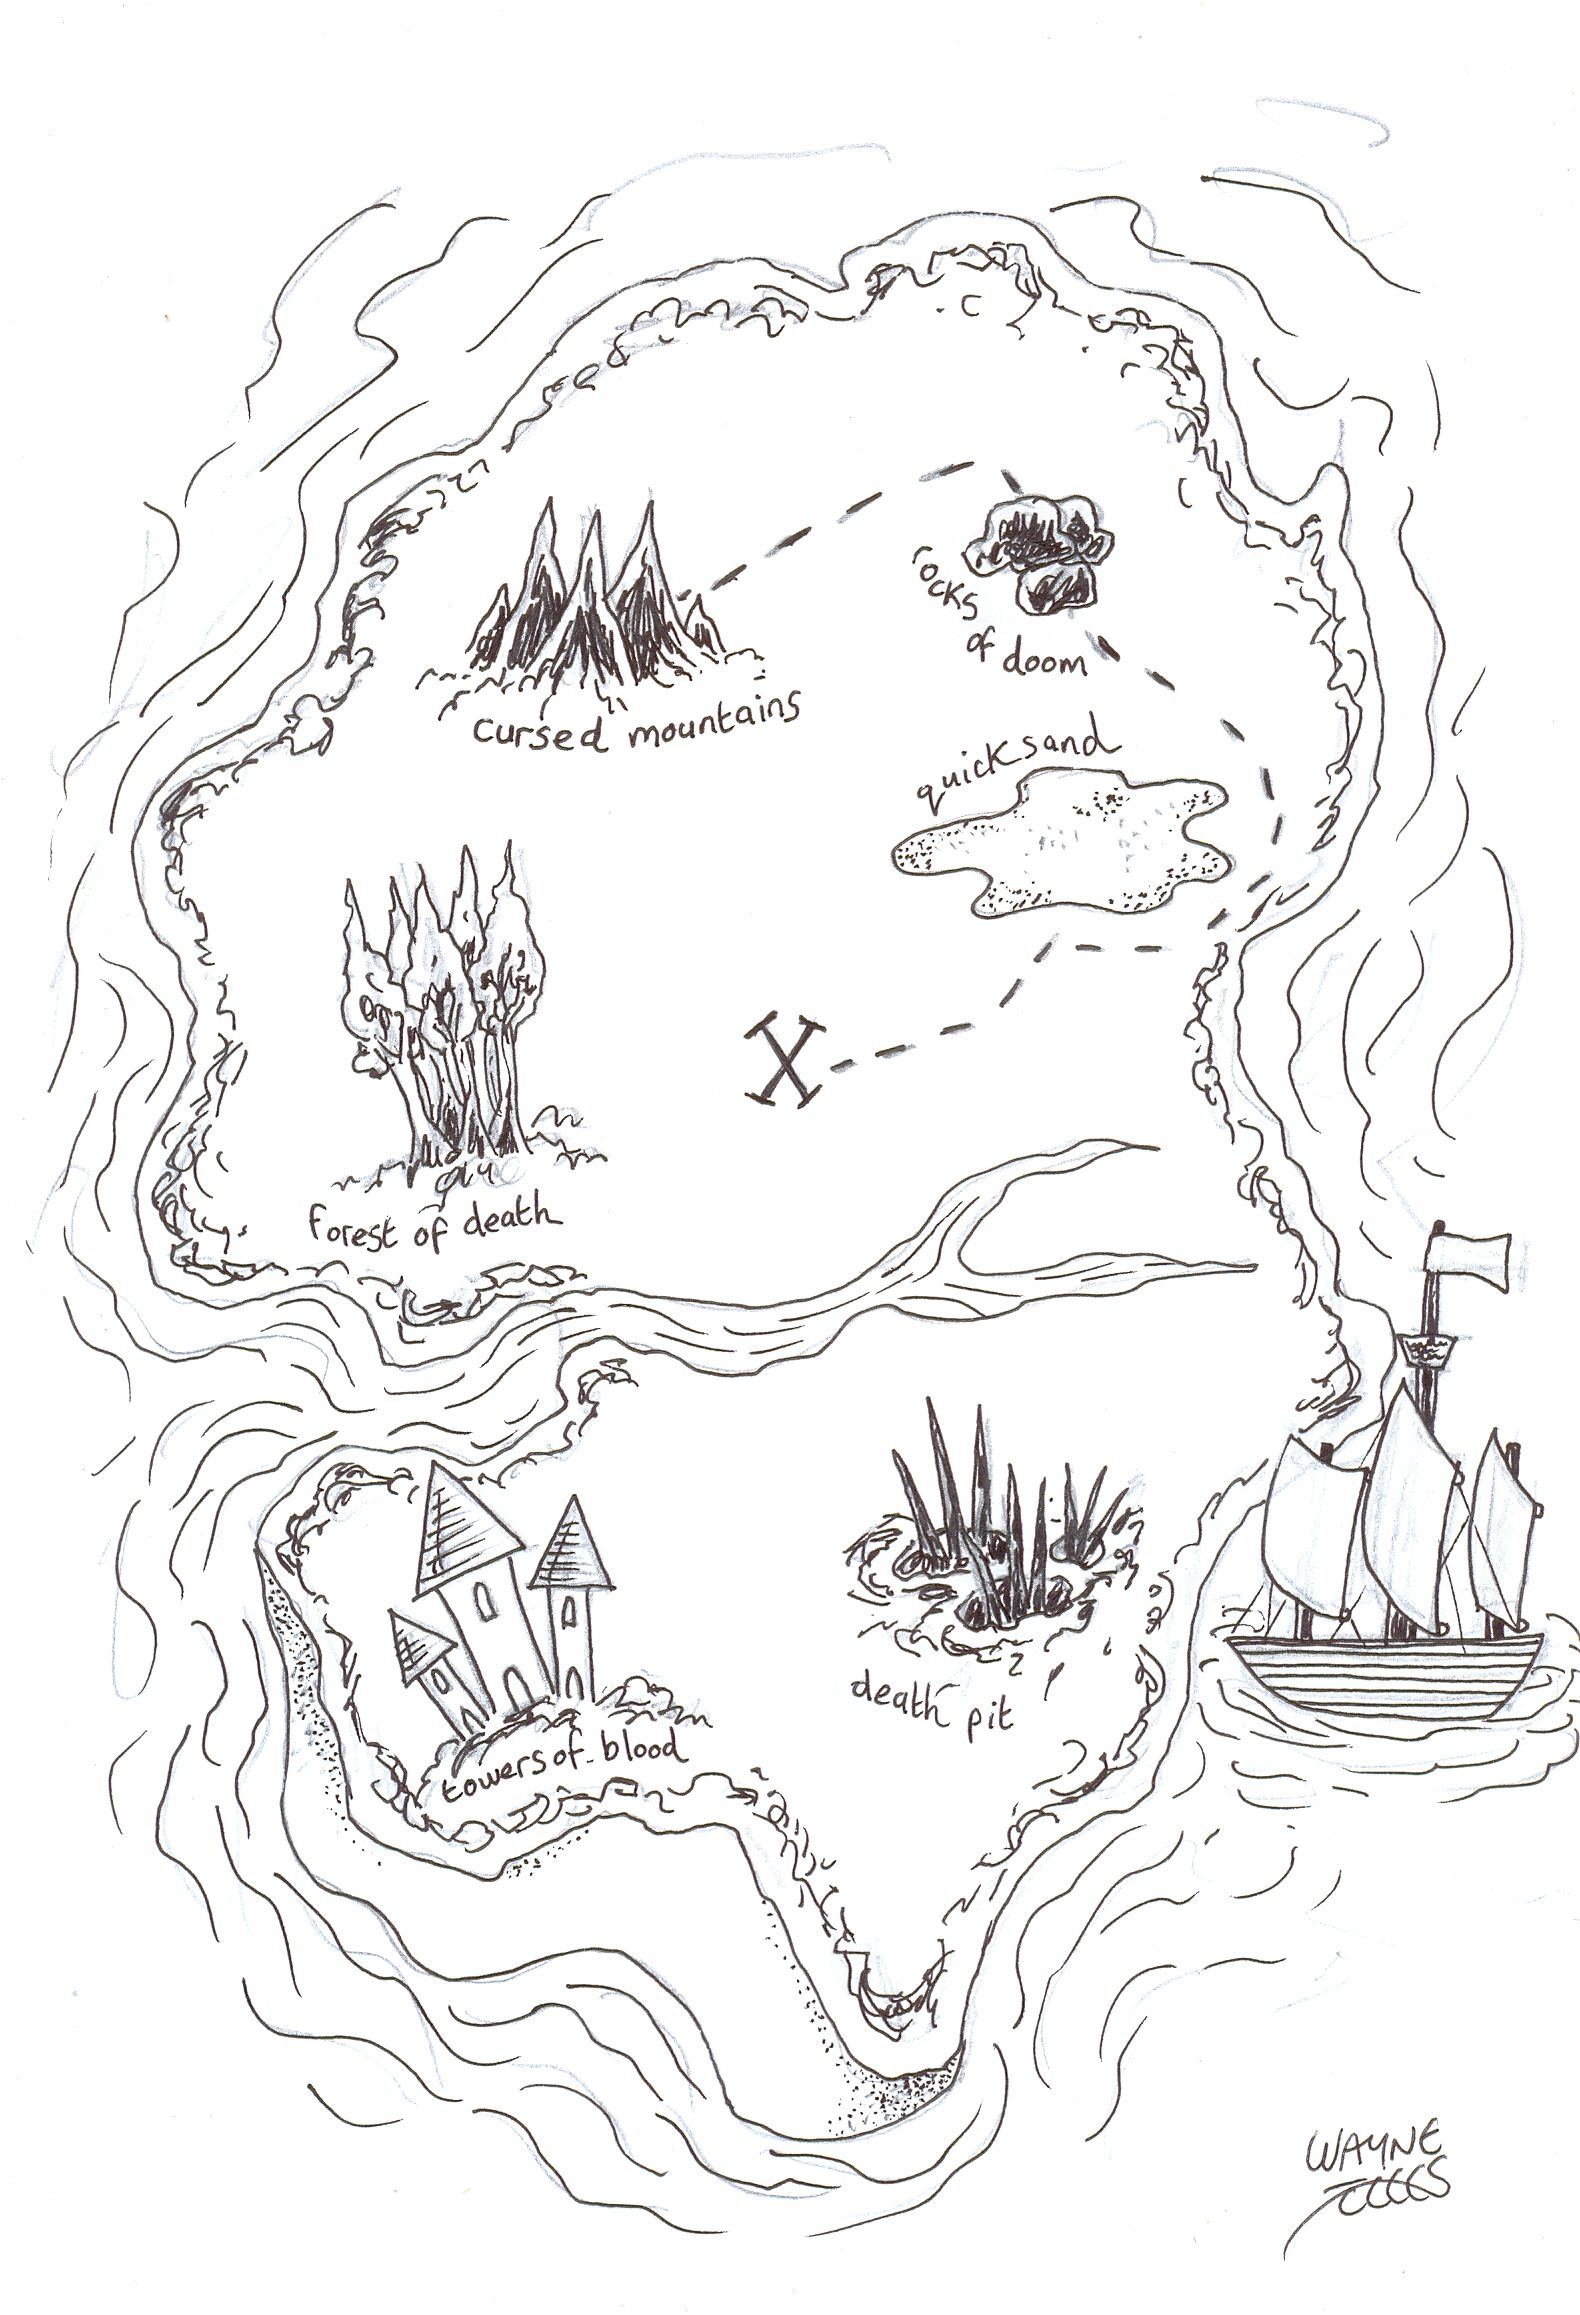 How To Draw A Pirate Treasure Map Pirate Treasure Maps Pirate